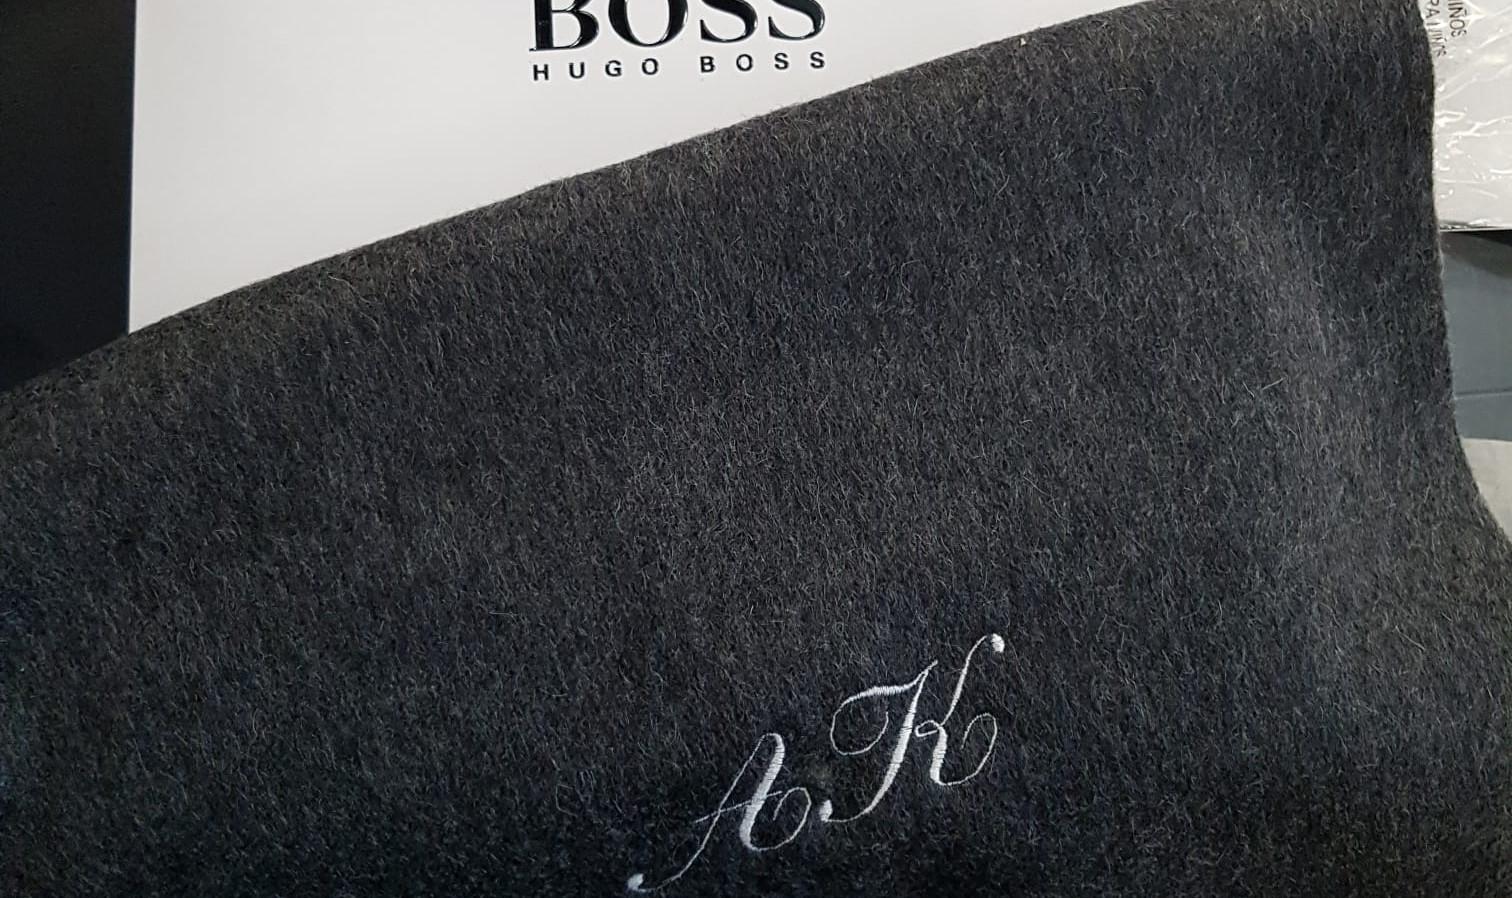 Monogrammed scarf at Hugo Boss